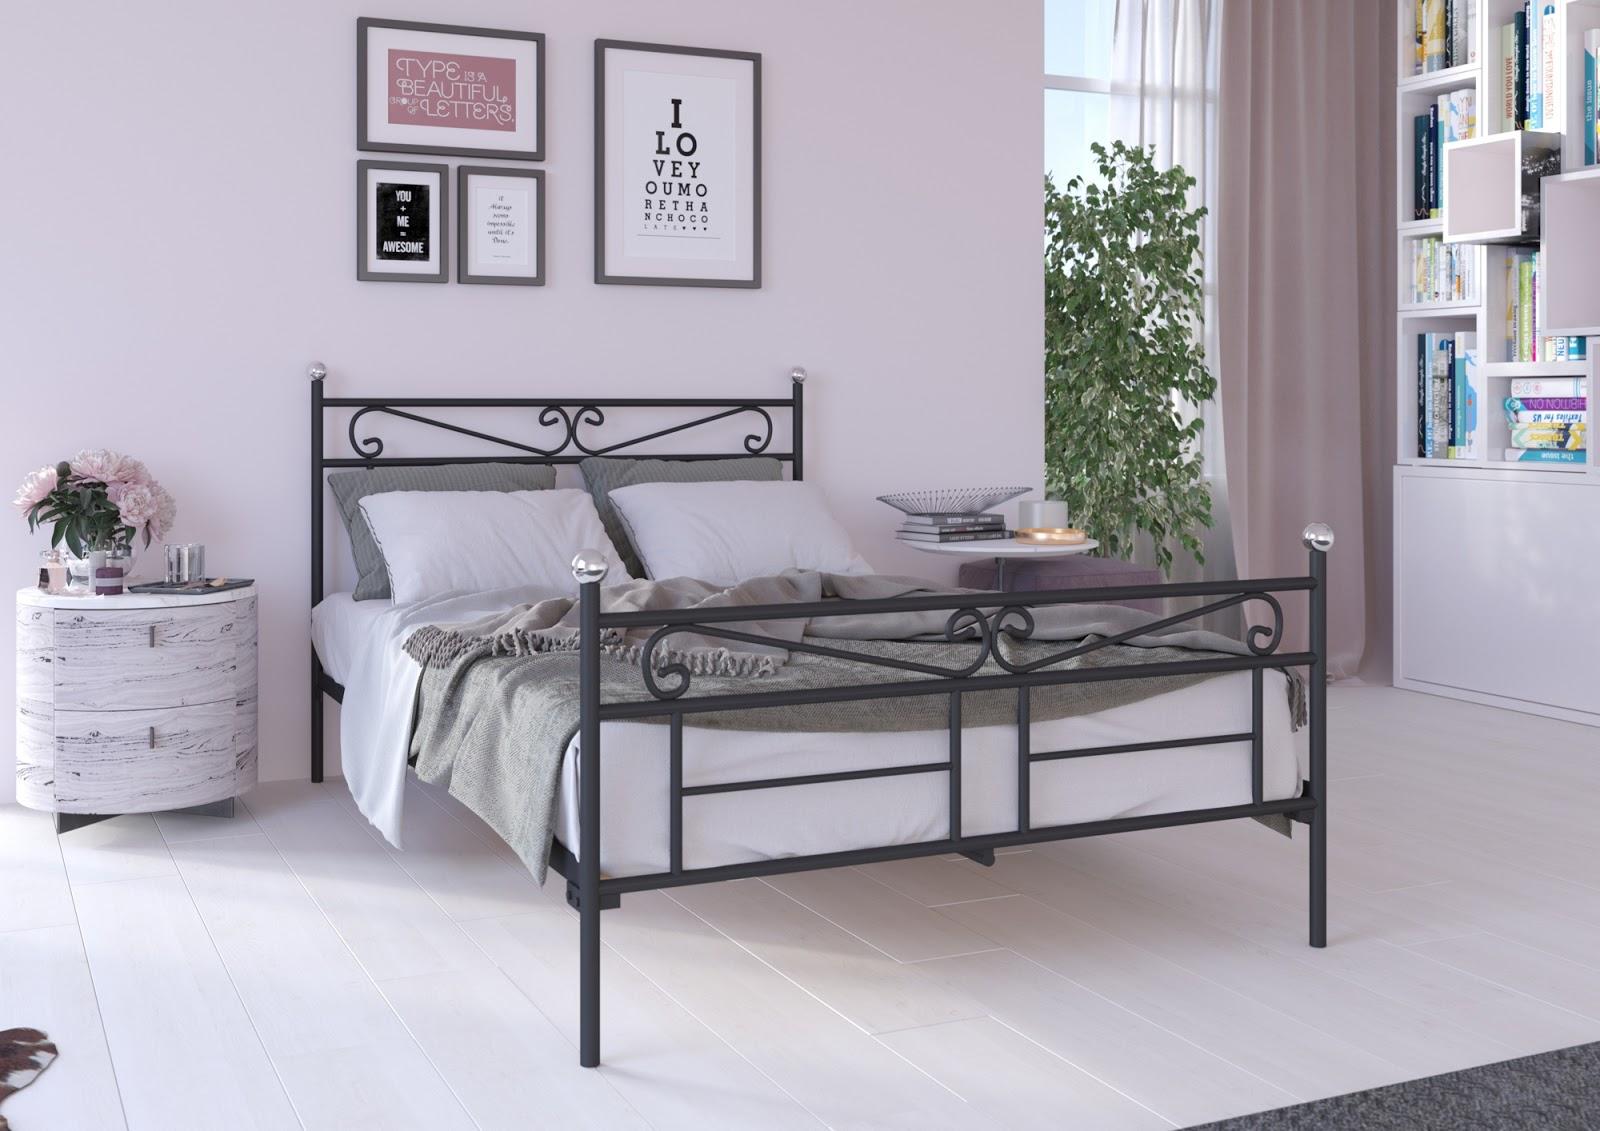 Łóżko metalowe wzór 29